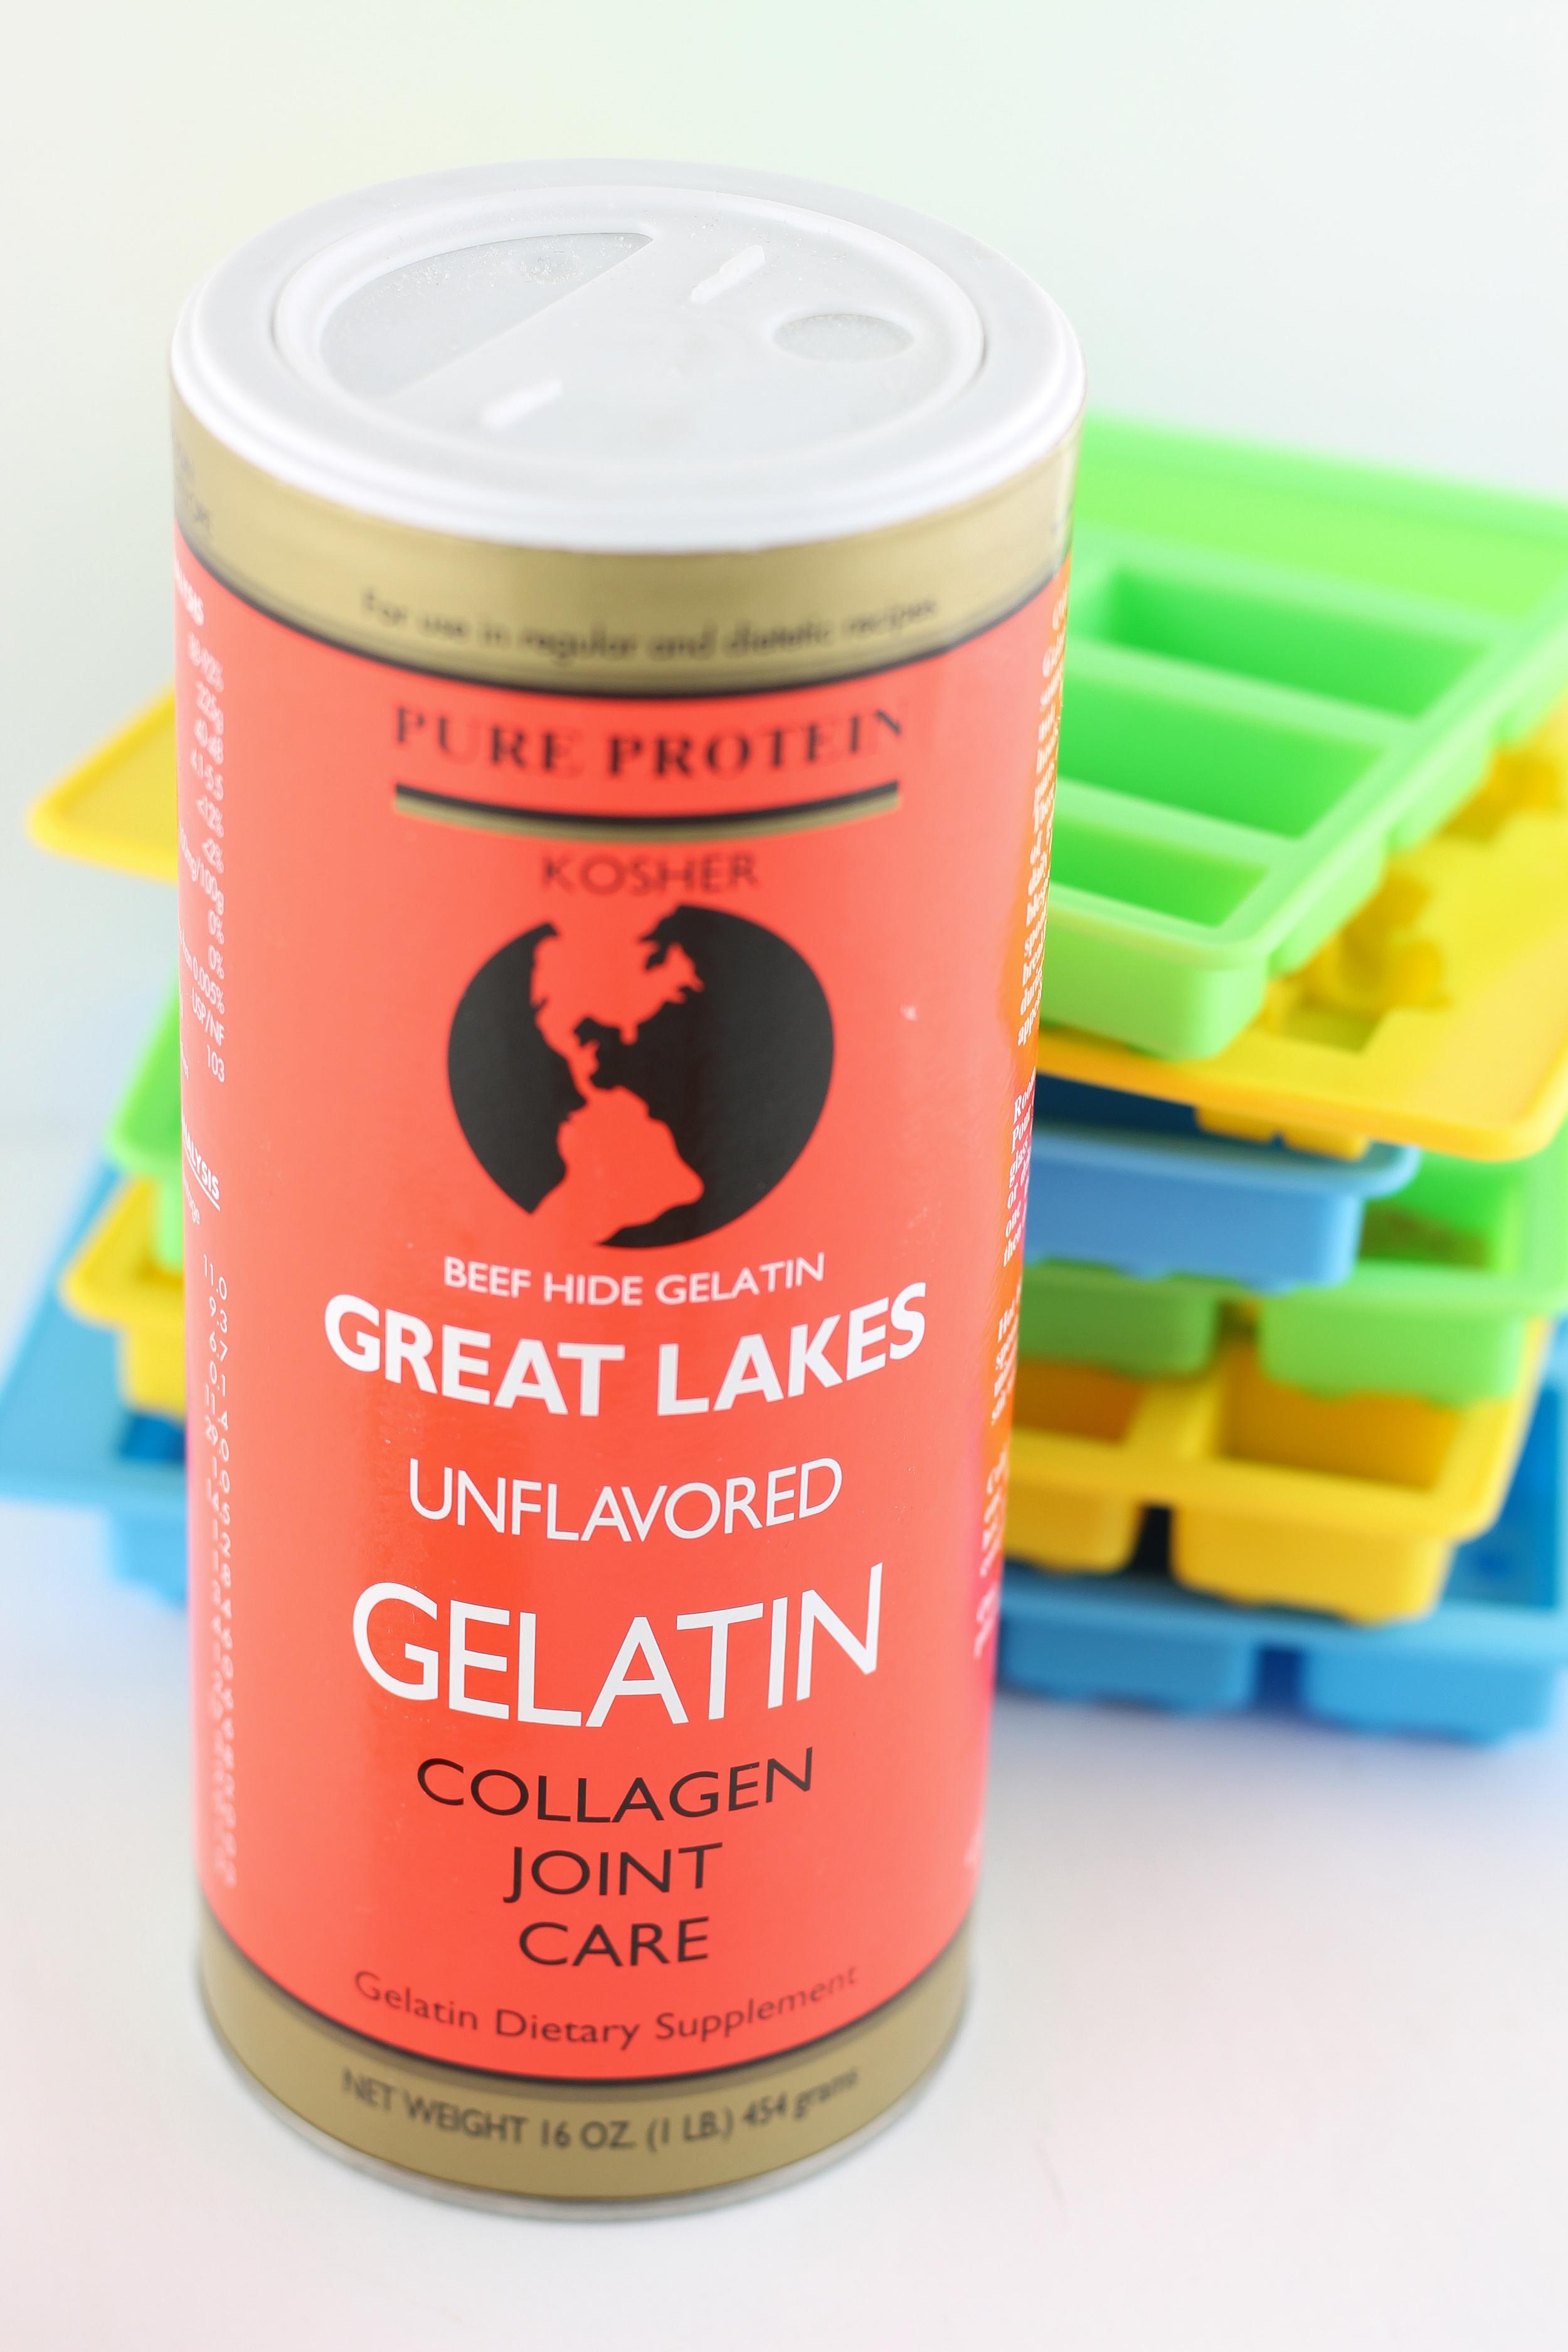 Gelatin Gummies, Gut Health, Healing Gummies, Paleo, Primal, Joint Relief, Skin Care, Kombucha, Real Food, Low Sugar